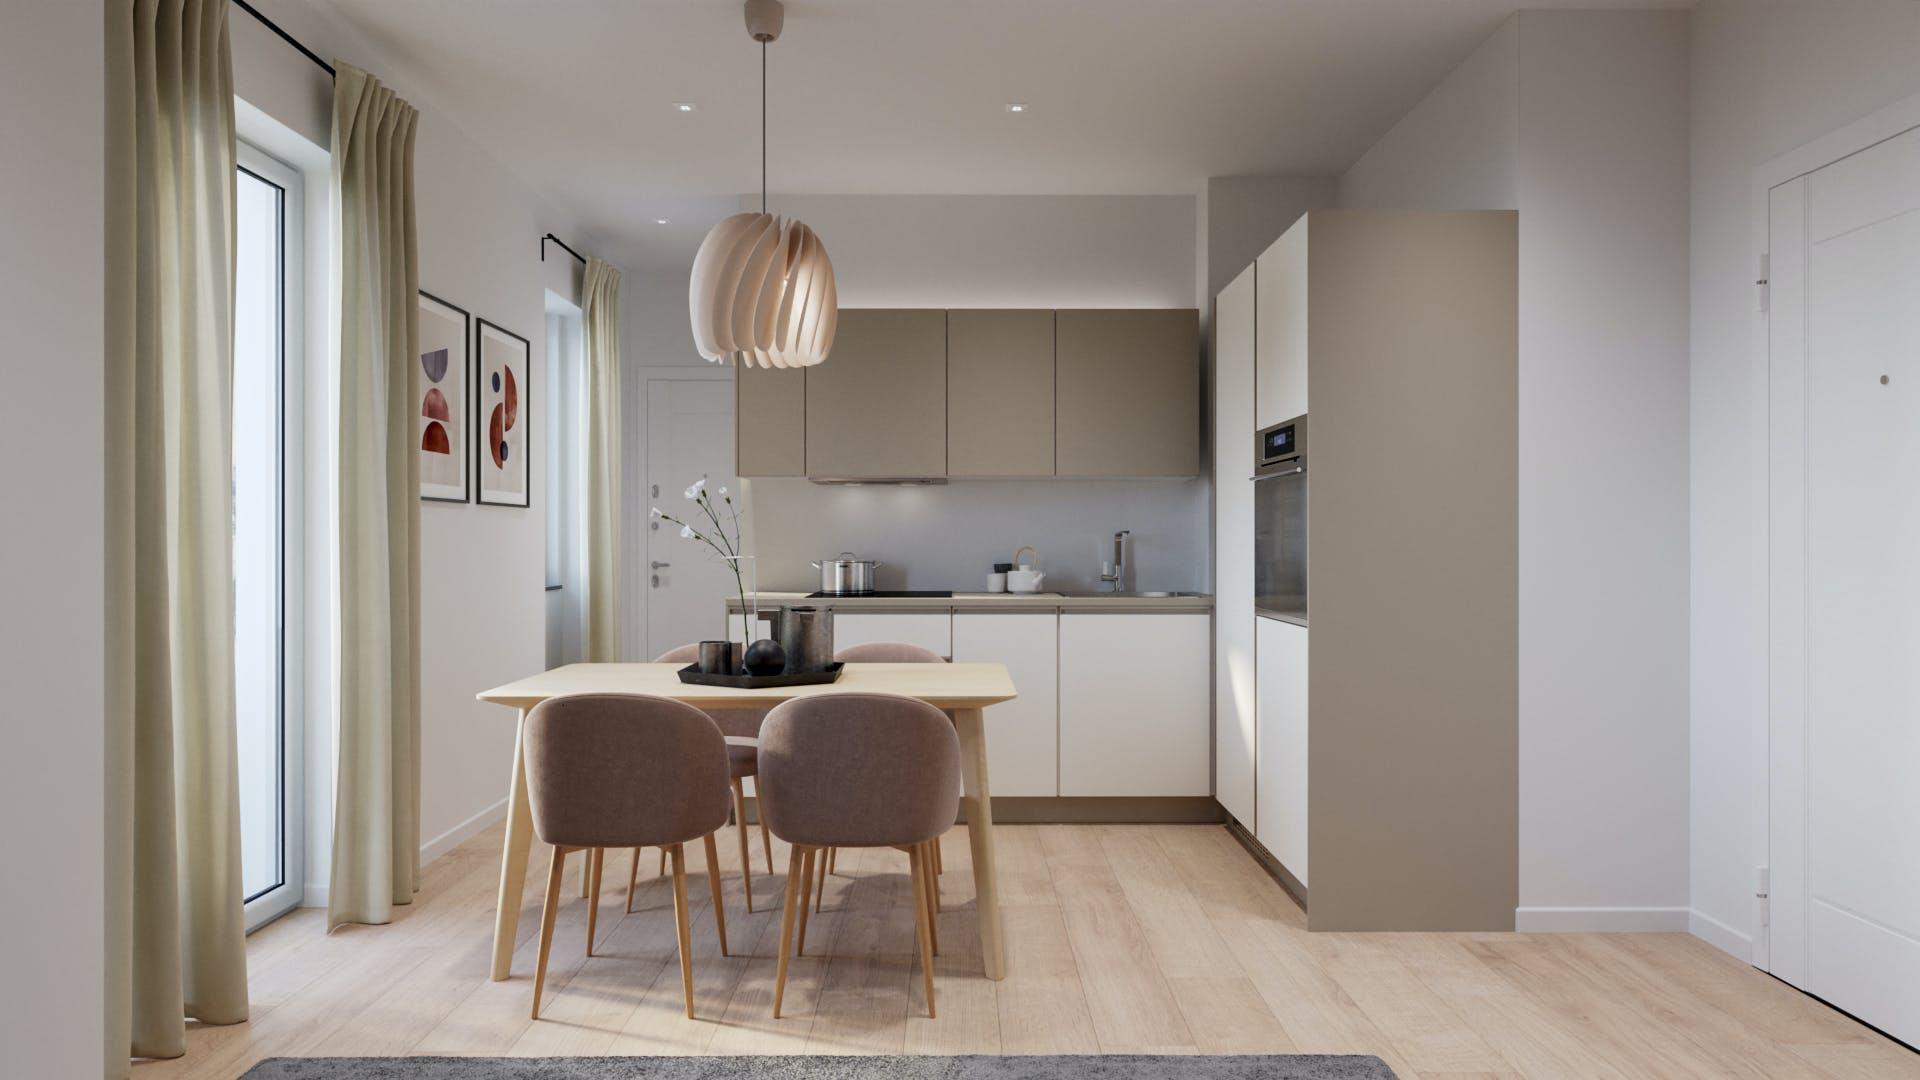 One-bedroom Apartment of 51m² in Via Napo Torriani 10